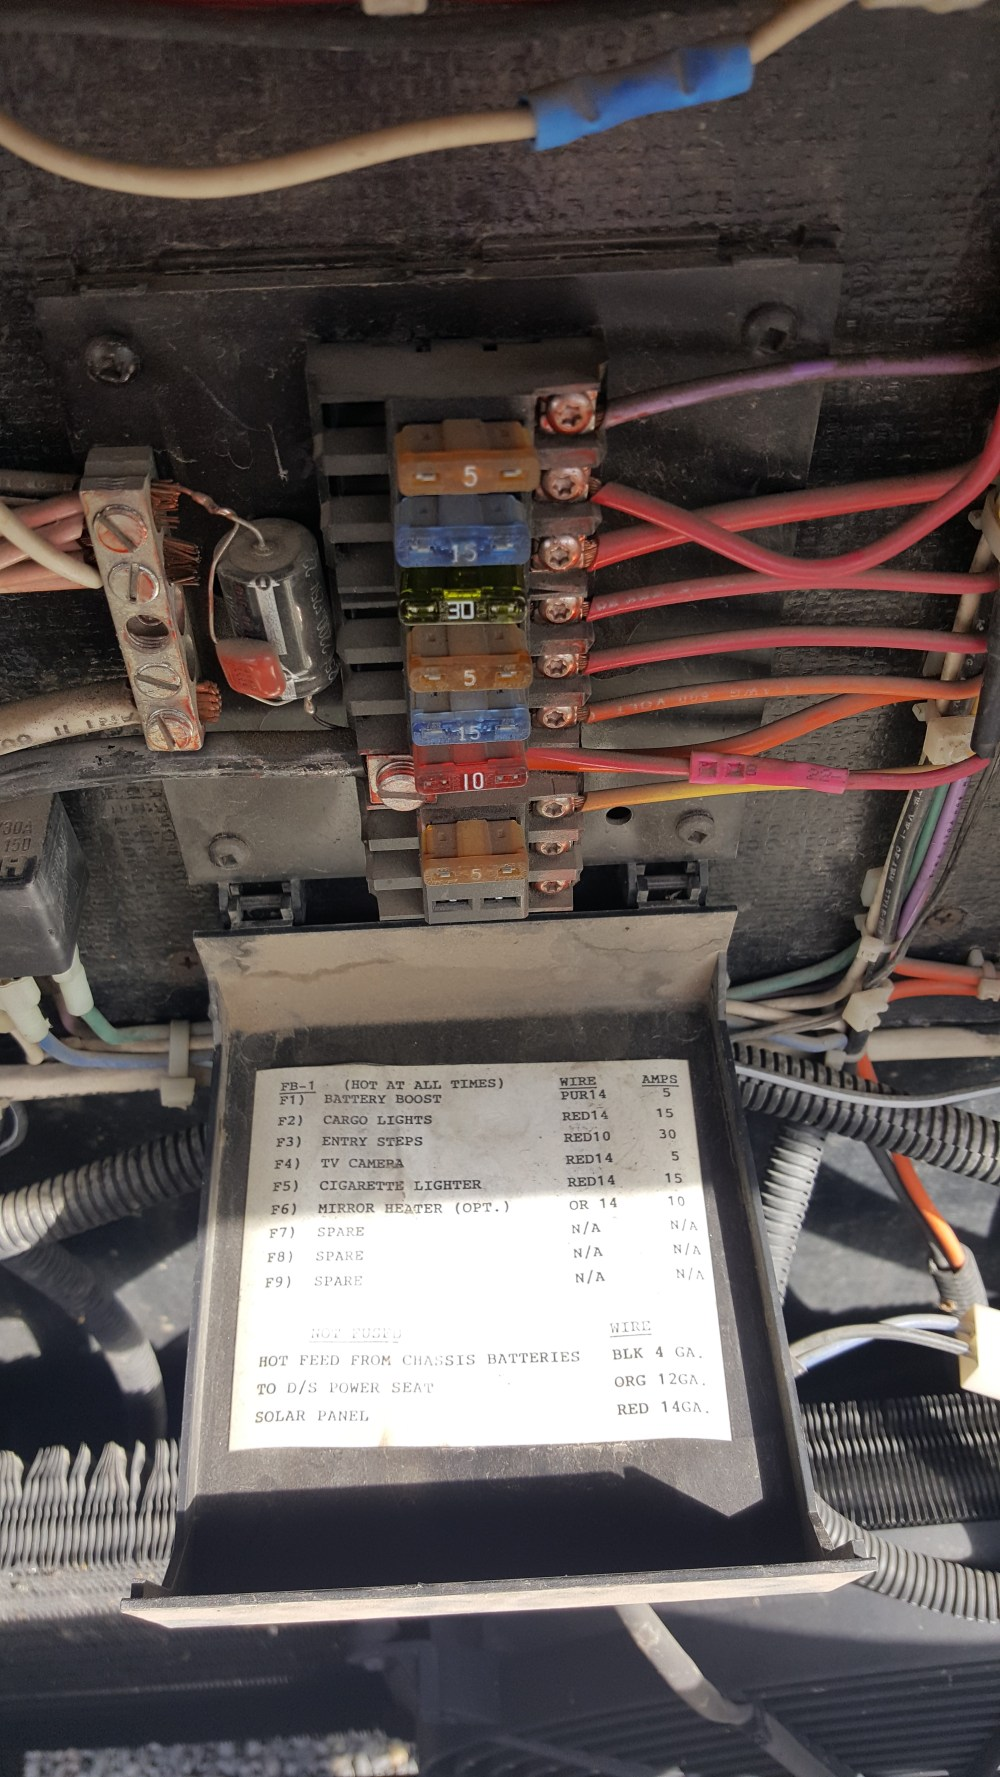 medium resolution of mystery fuse box electrical fmca rv forums a community of rvers 003 jpg 2001 safari